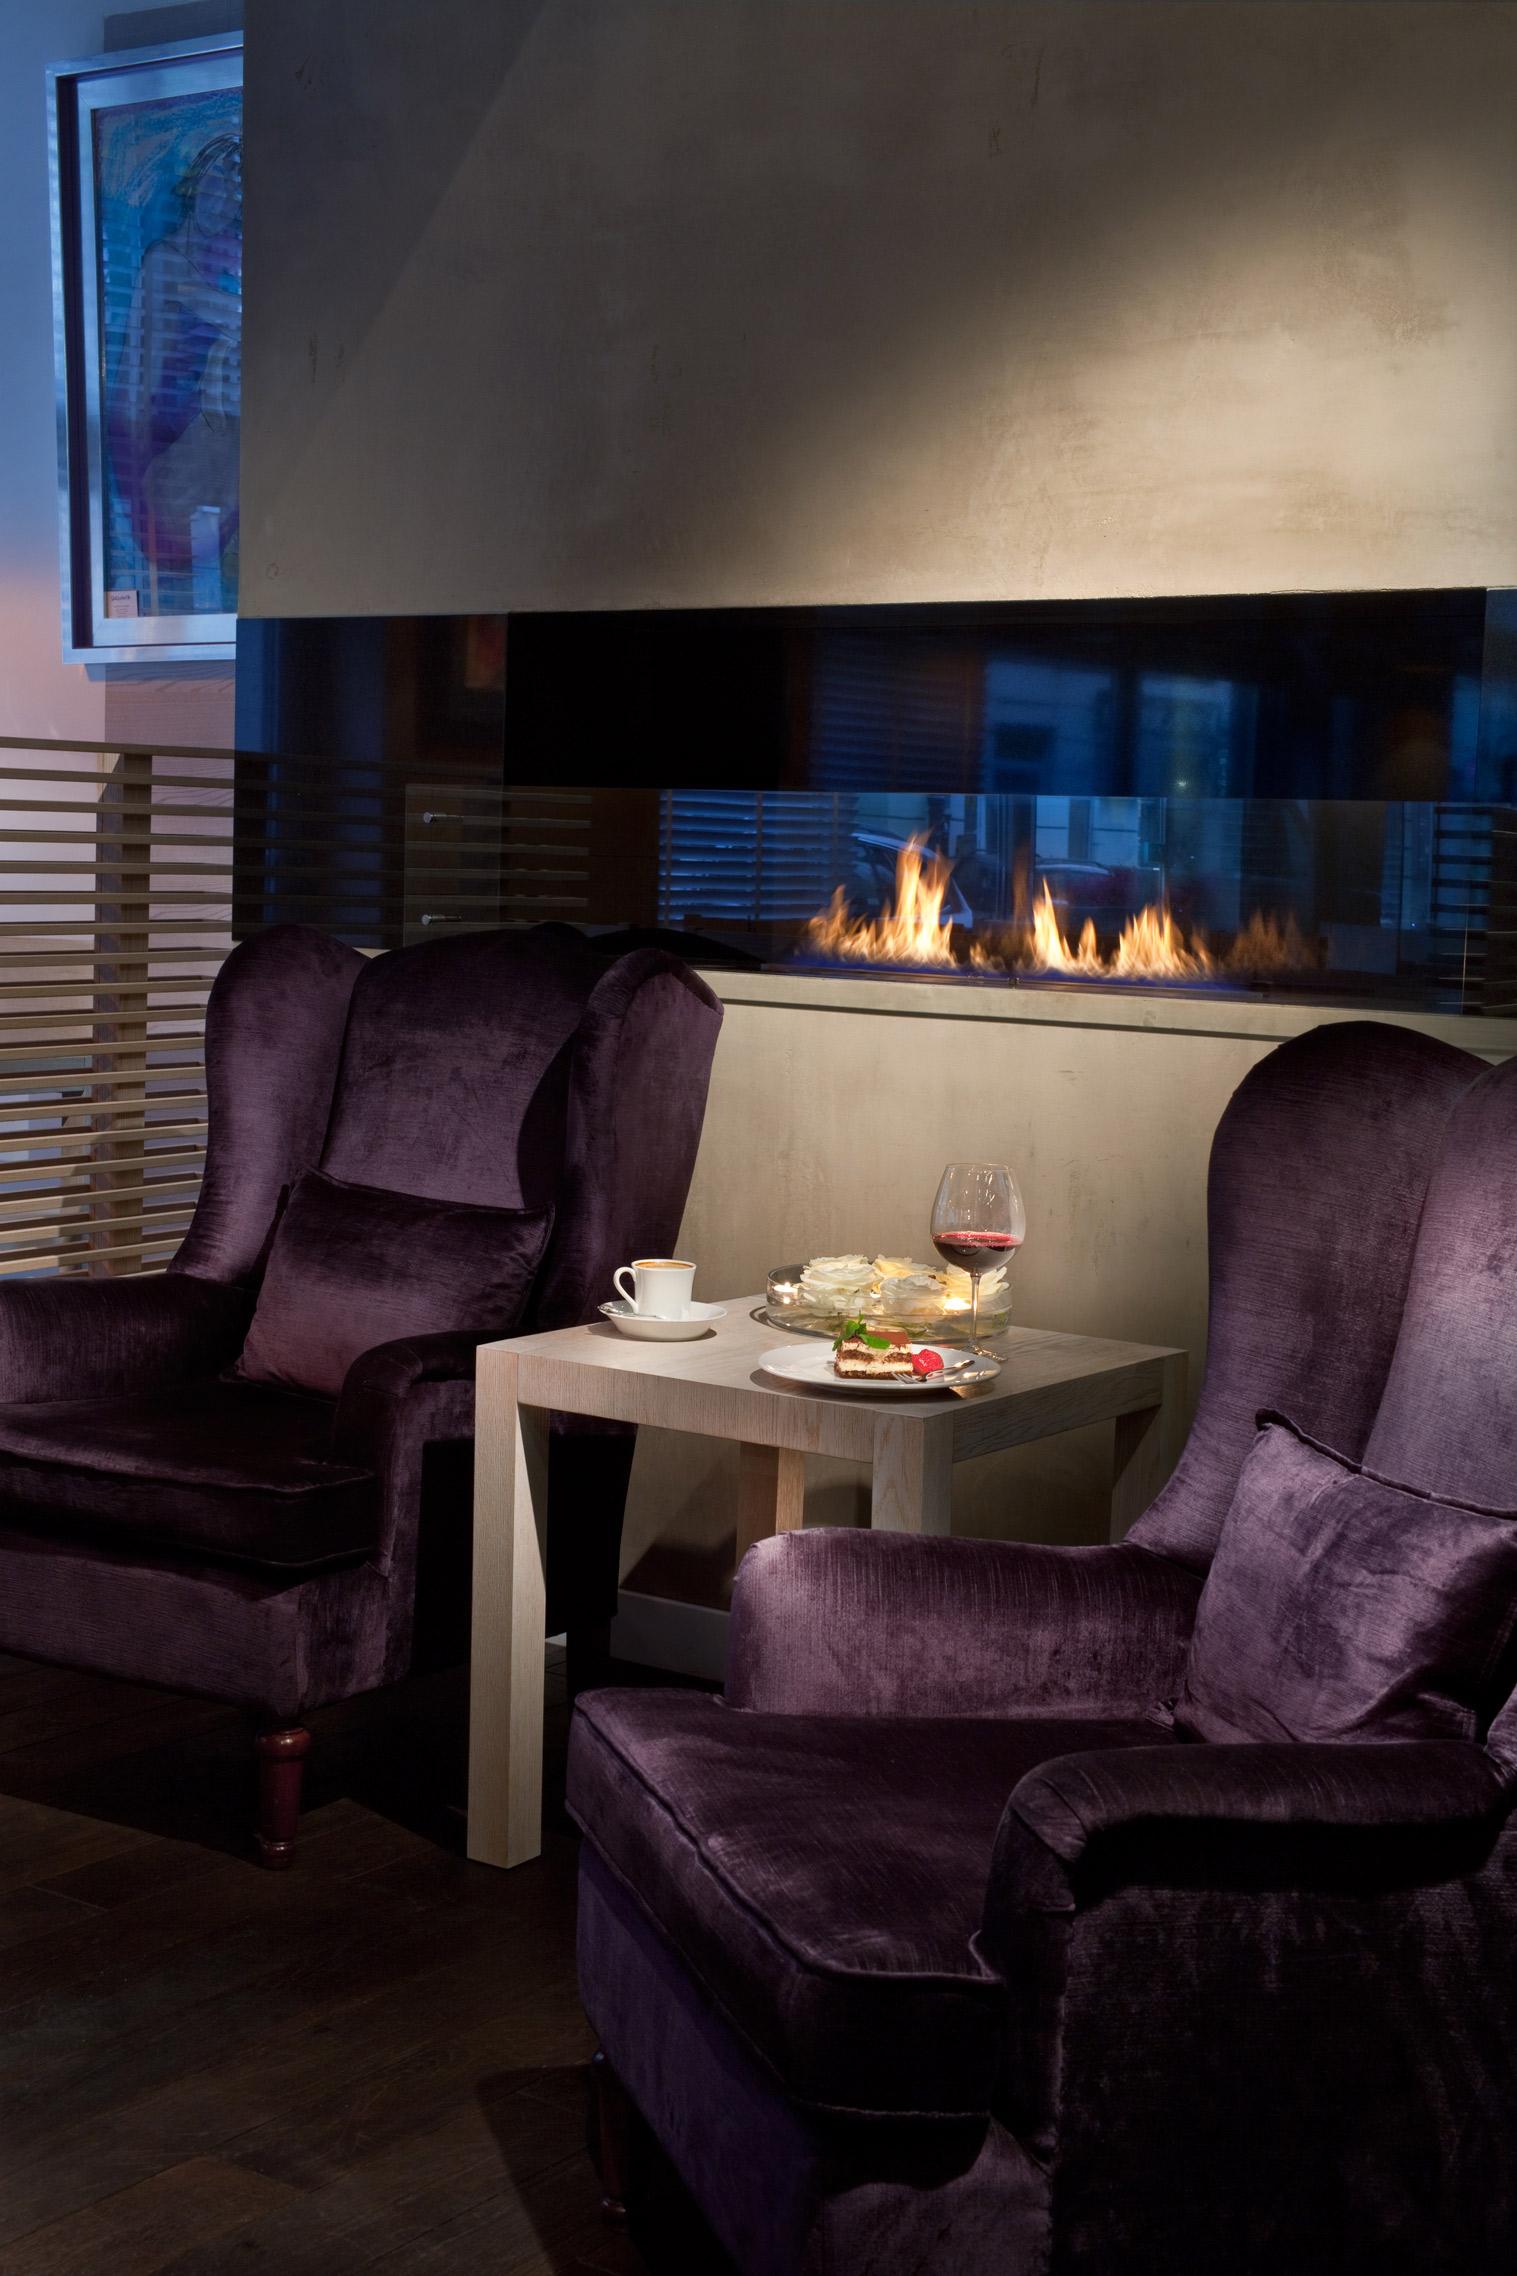 Fire-Line-Automatic-Planika-Piekna-Bistro-Restaurant-Warsaw-Poland-Design-OnOff-Architekci.jpg